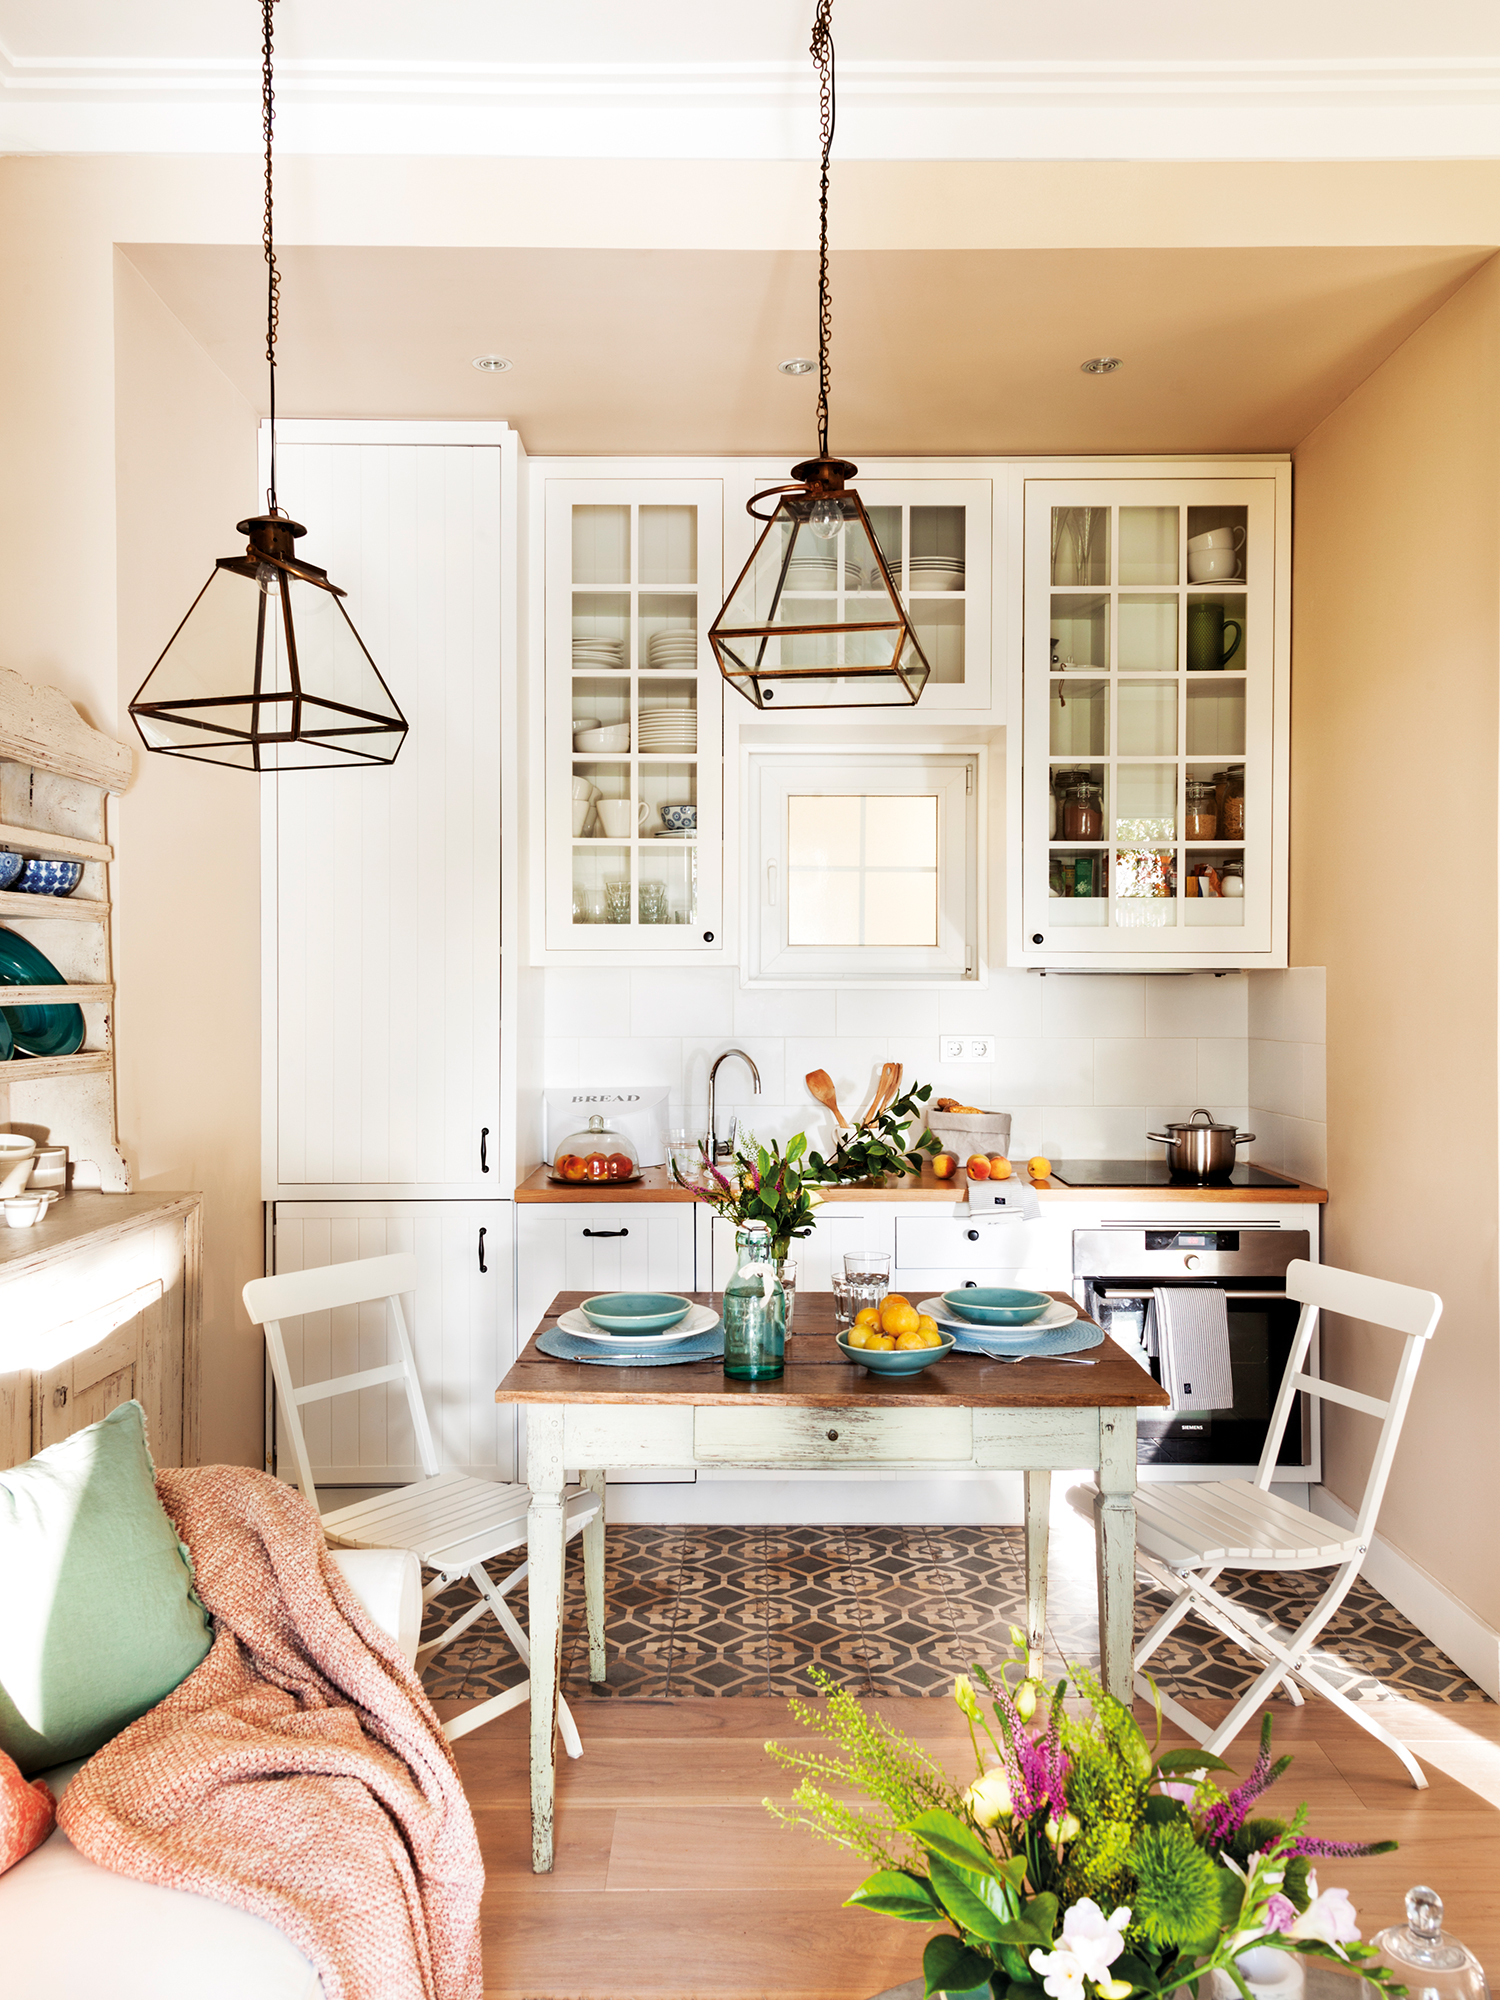 Cocinas peque as en un solo frente - Muebles para cocinas pequenas ...